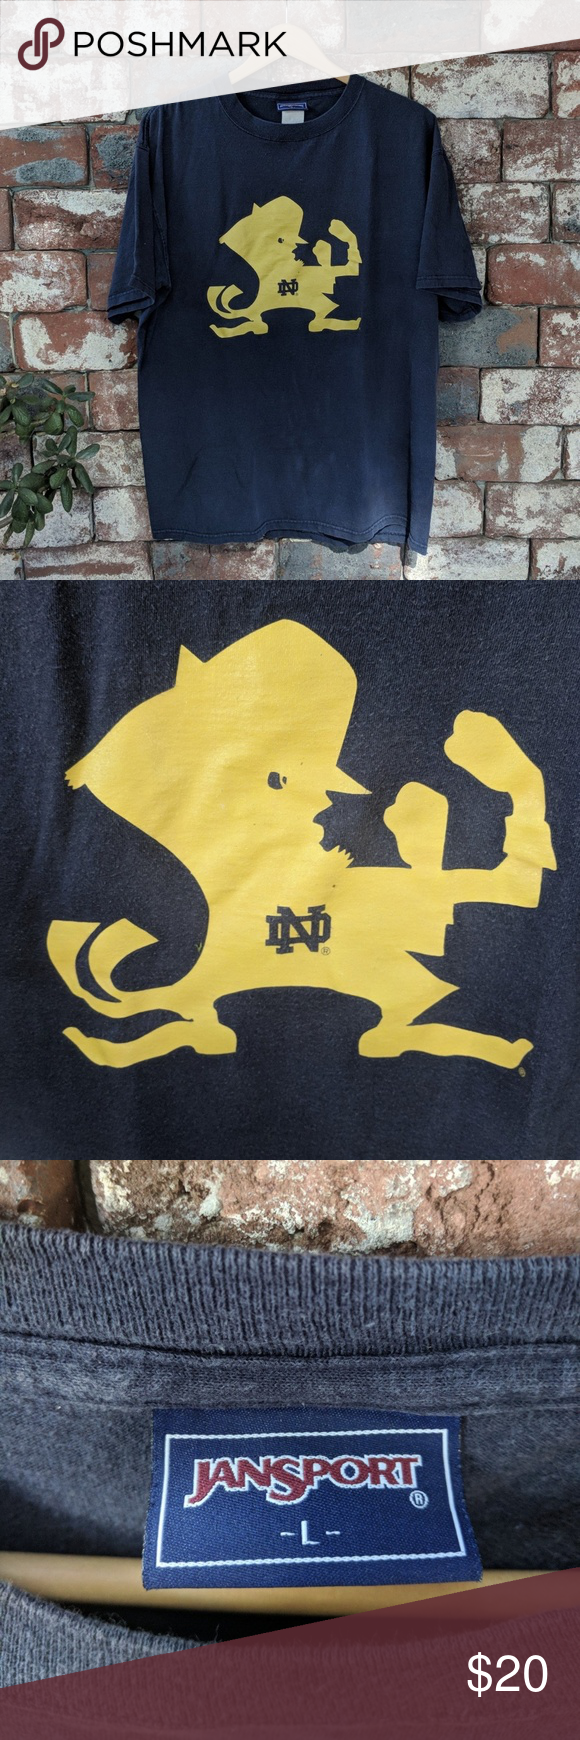 Vintage Notre Dame Fighting Irish tshirt Vintage Notre